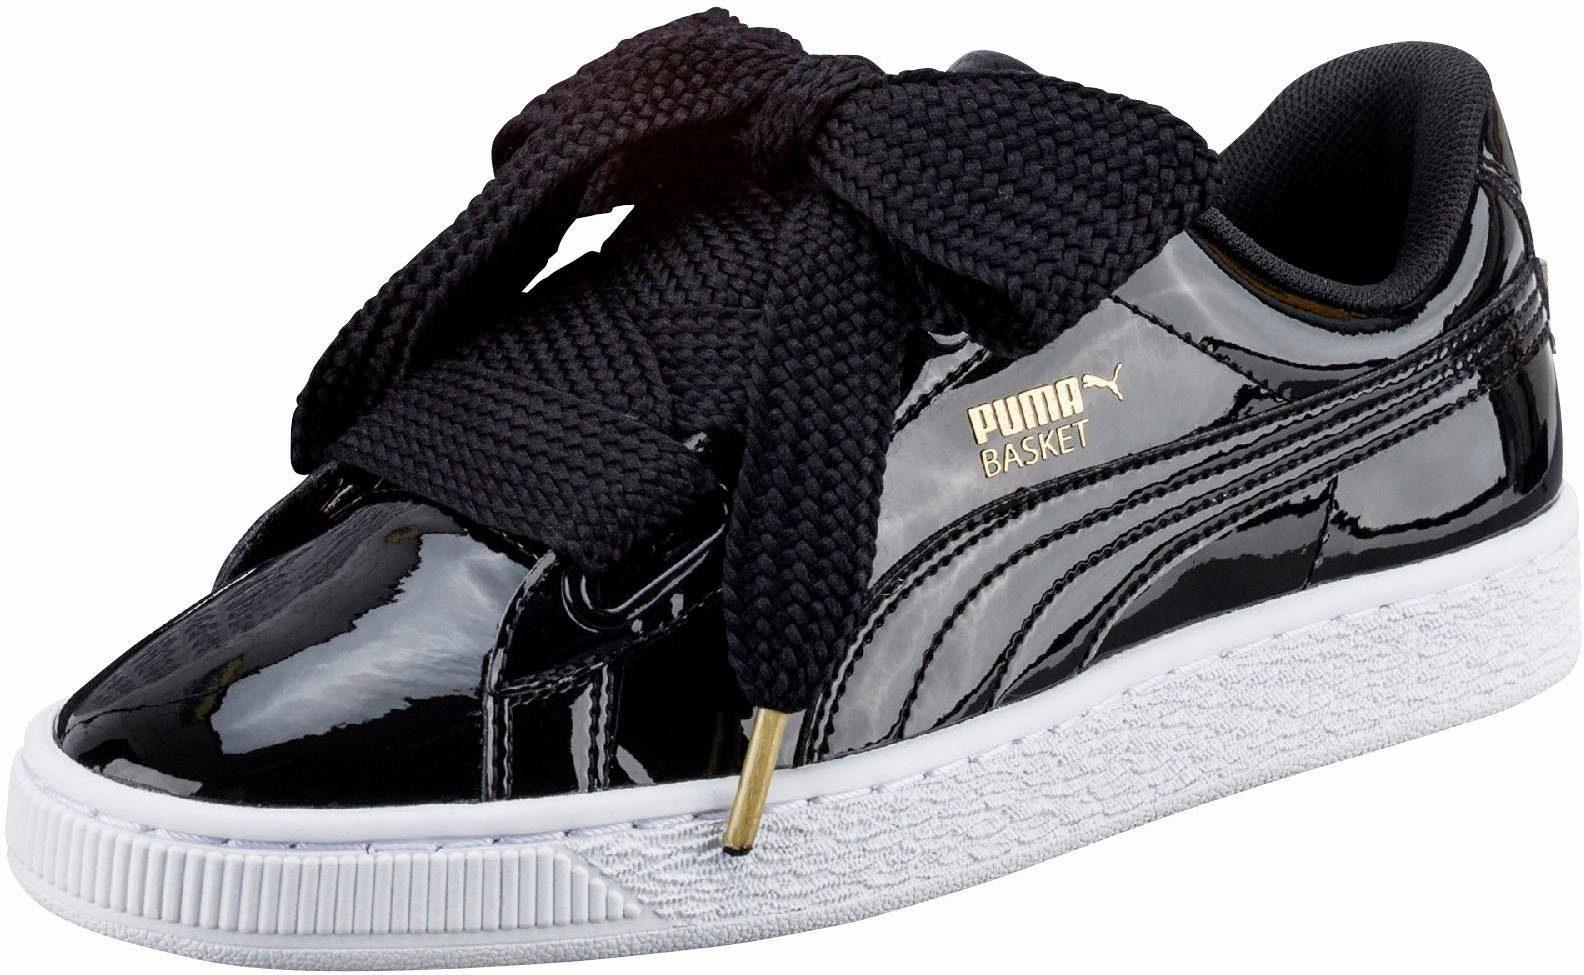 puma damen sneaker basket heart patent wn's